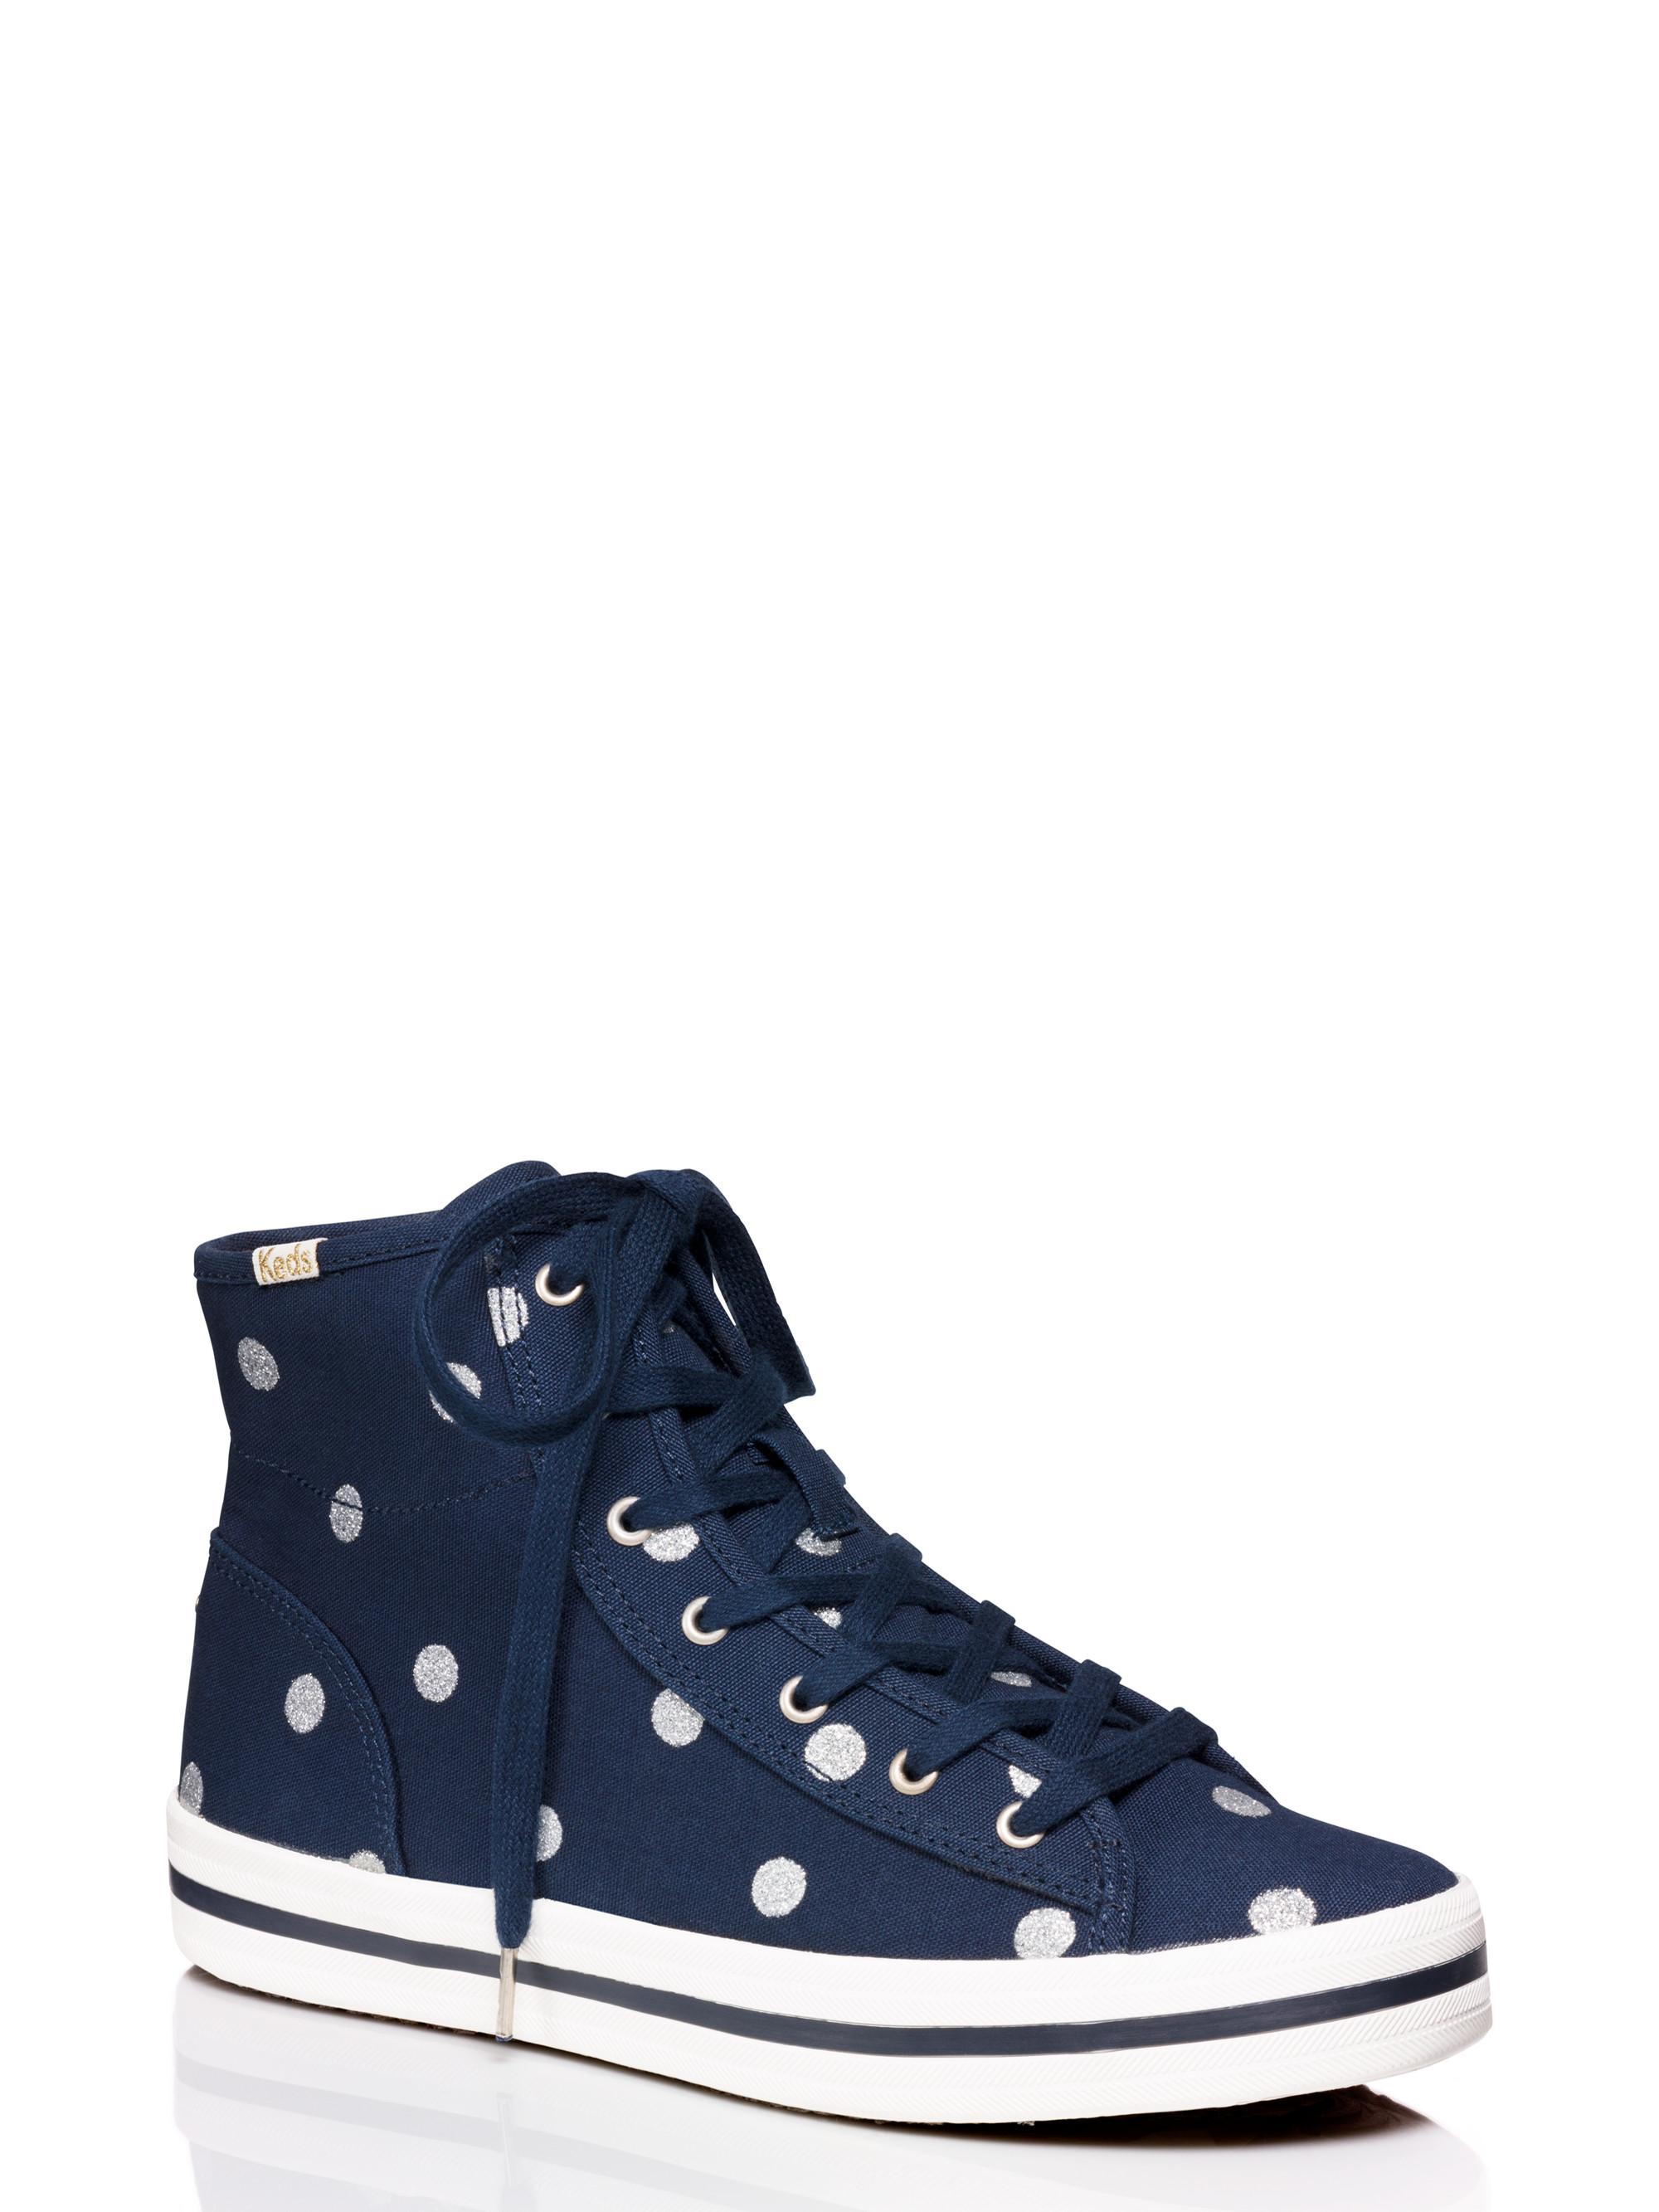 navy blue kate spade keds